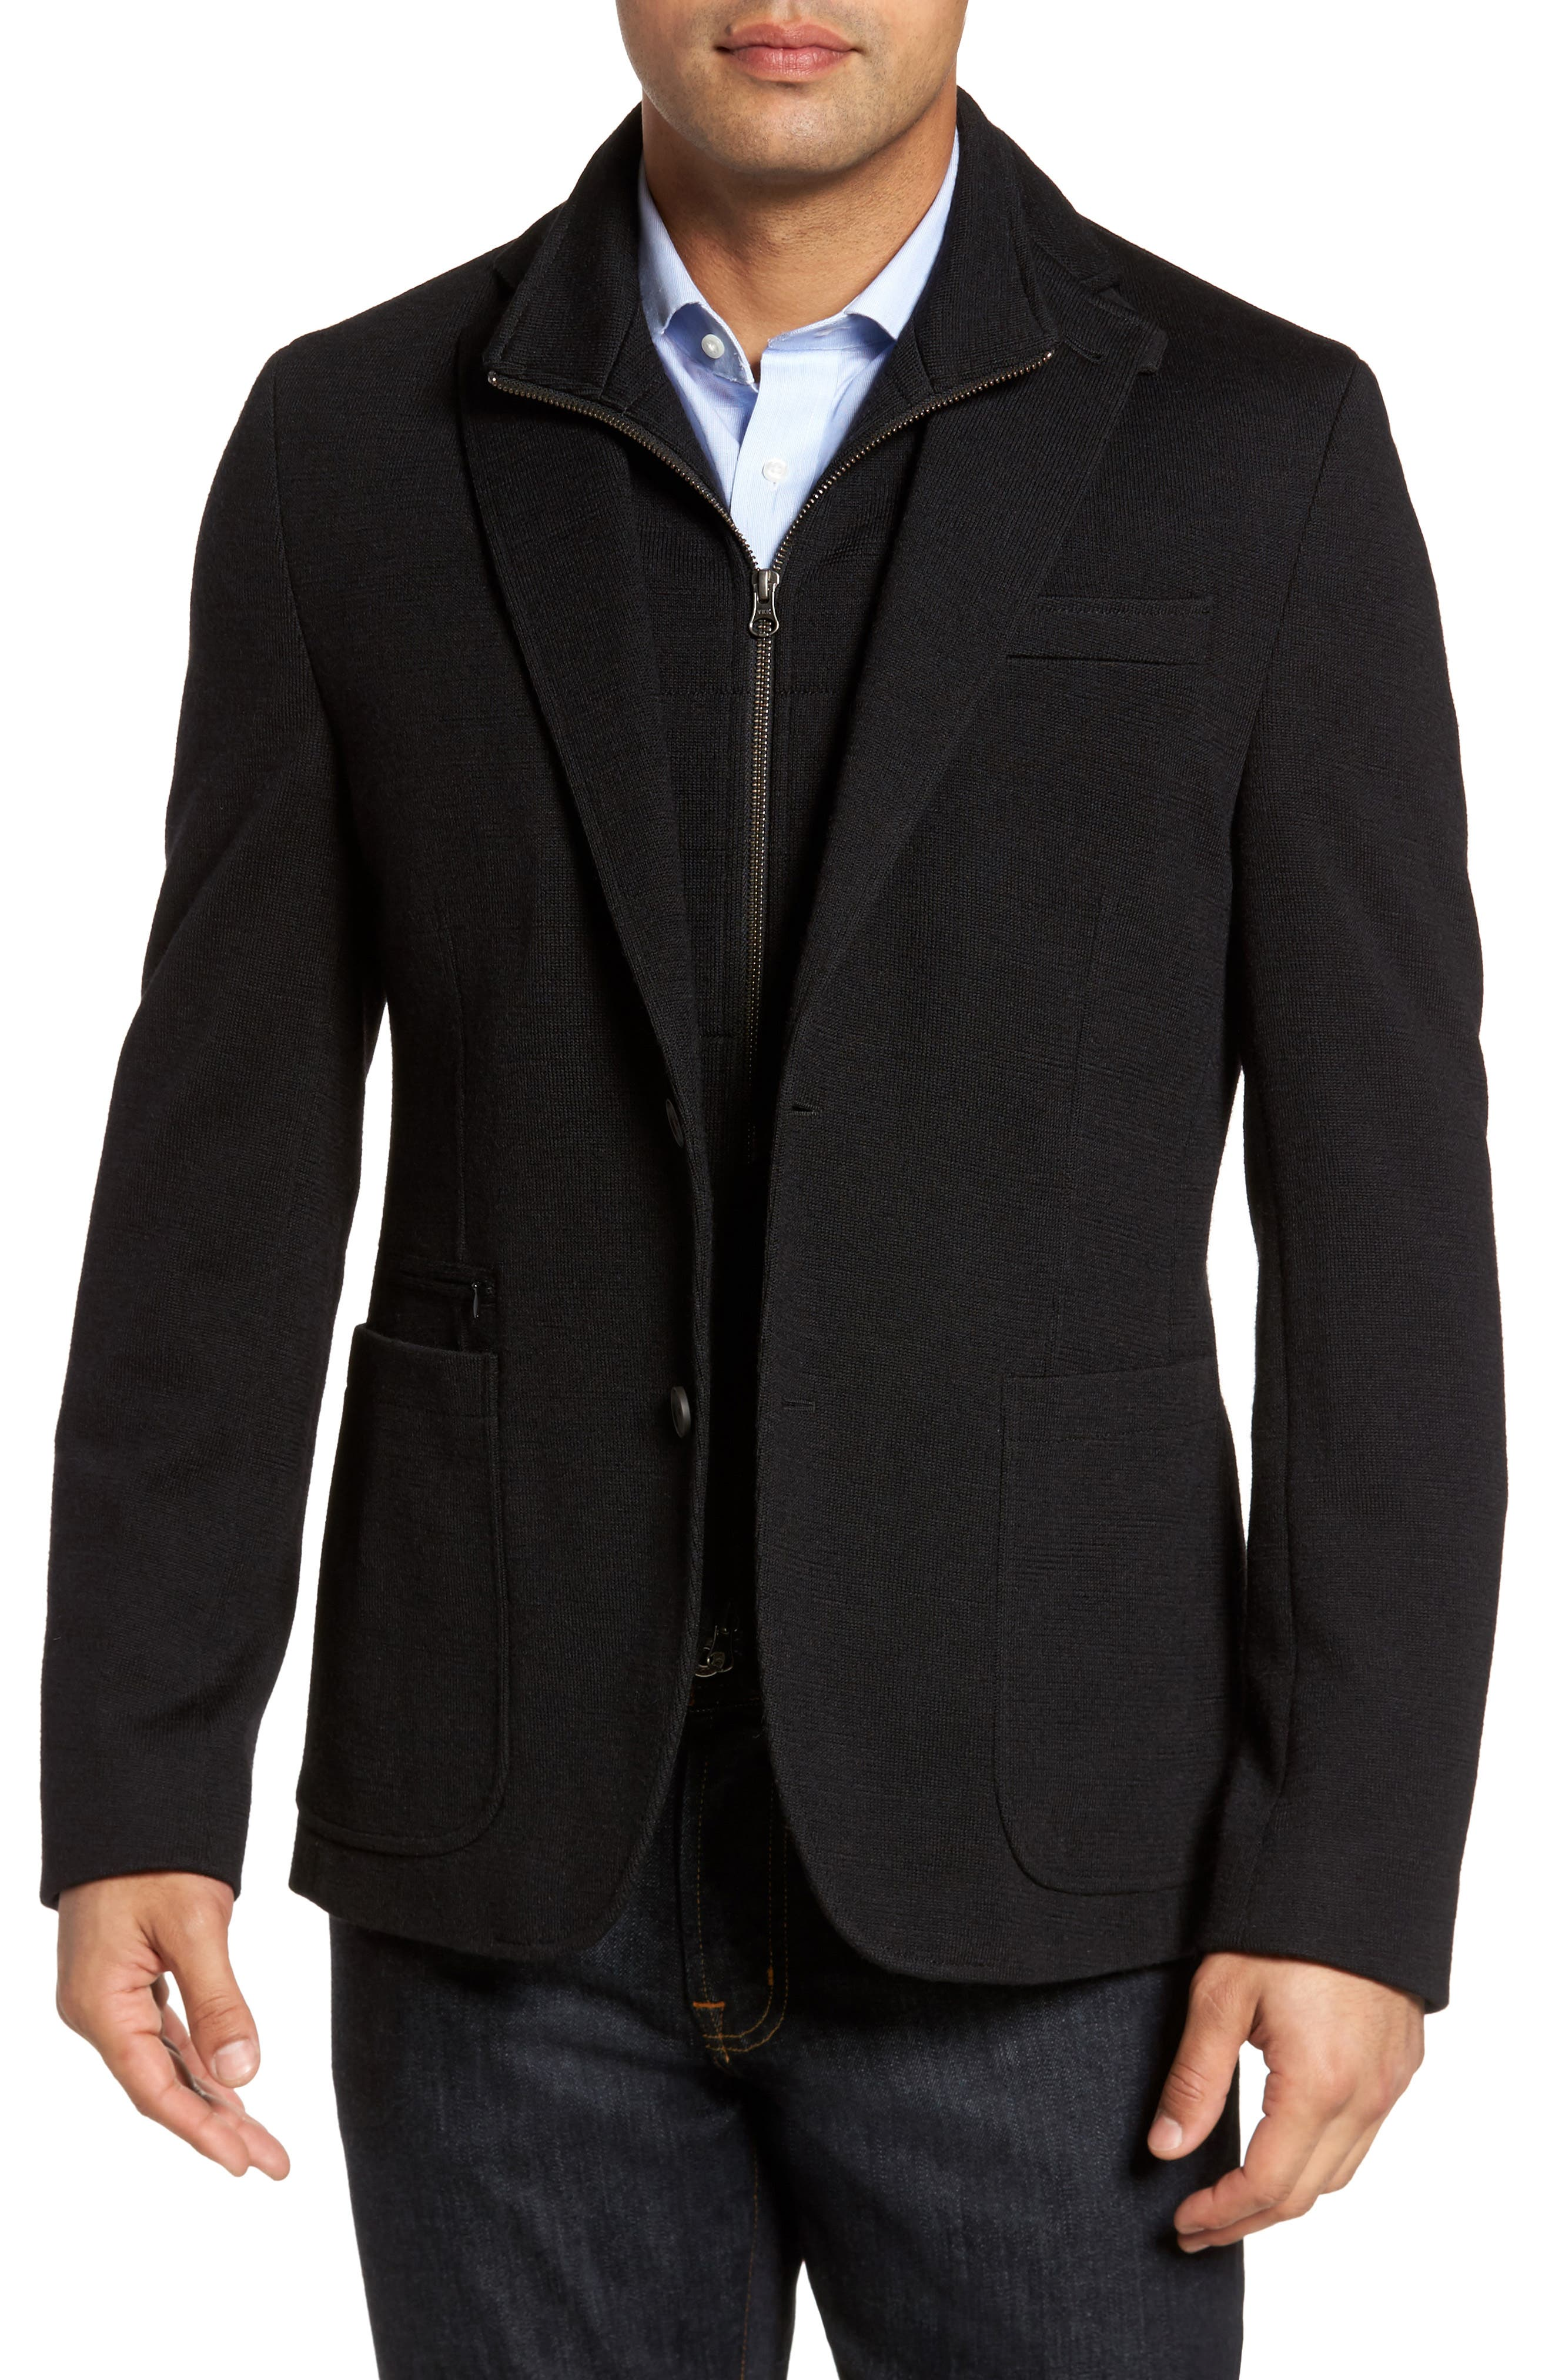 Main Image - Kroon Jones Aim Hybrid Classic Fit Knit Wool Blend Blazer